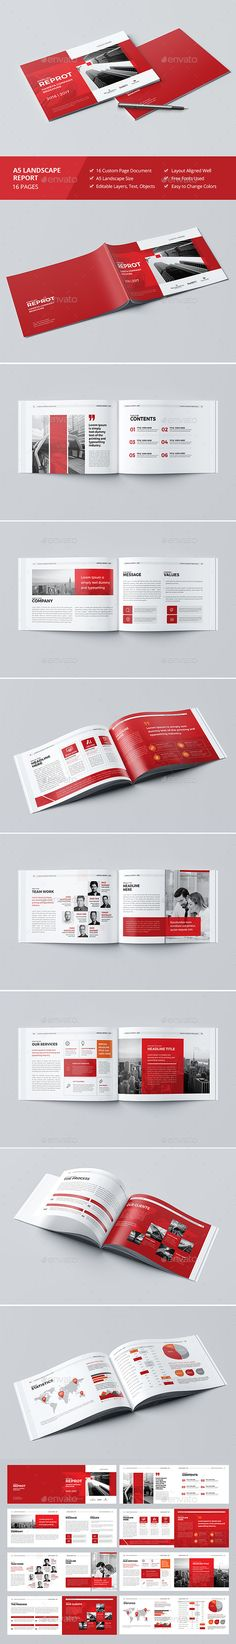 Haweya Company Brochure  Pages  Brochures Company Brochure